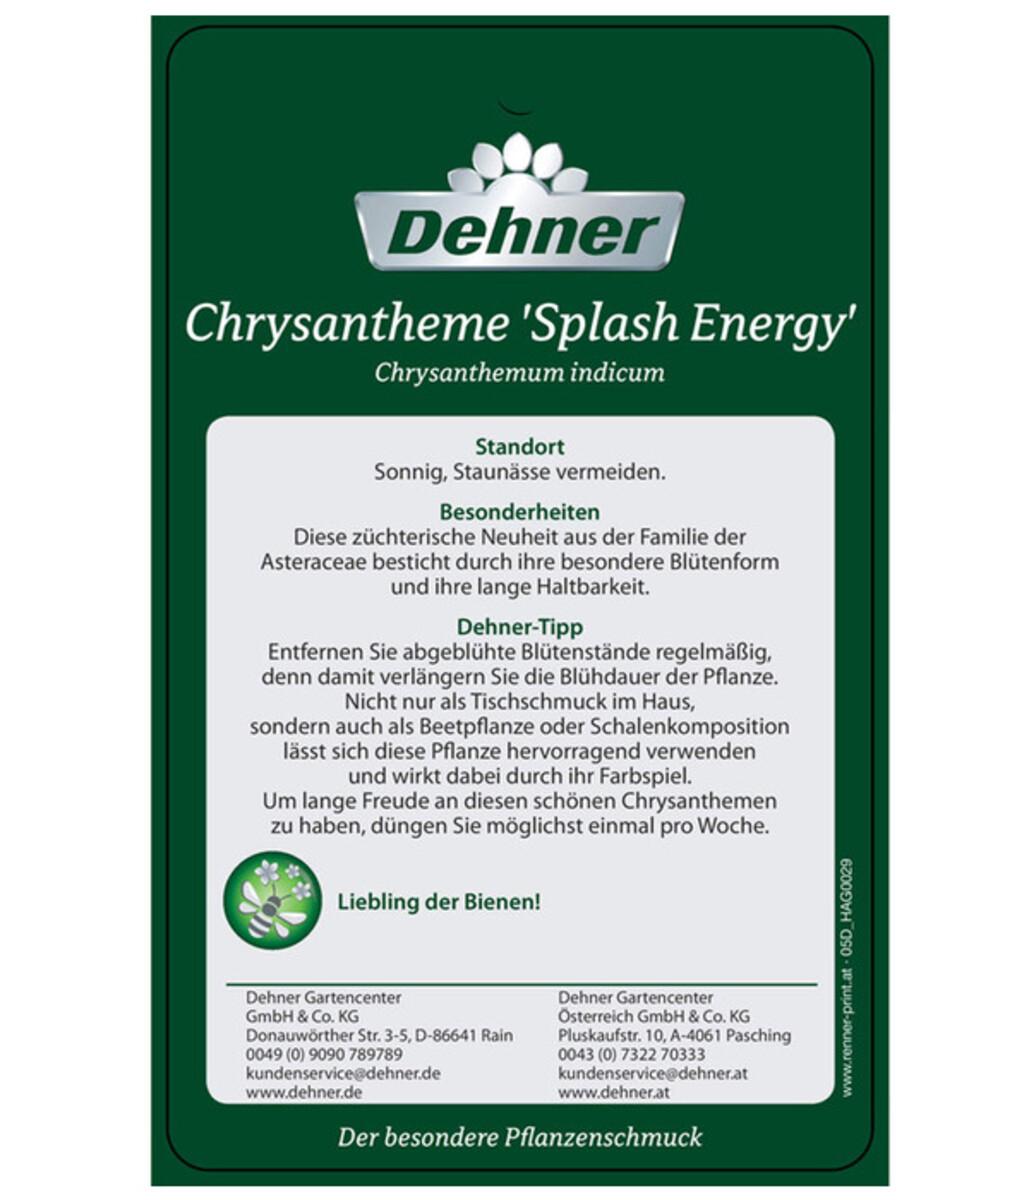 Bild 4 von Chrysantheme 'Splash Energy'